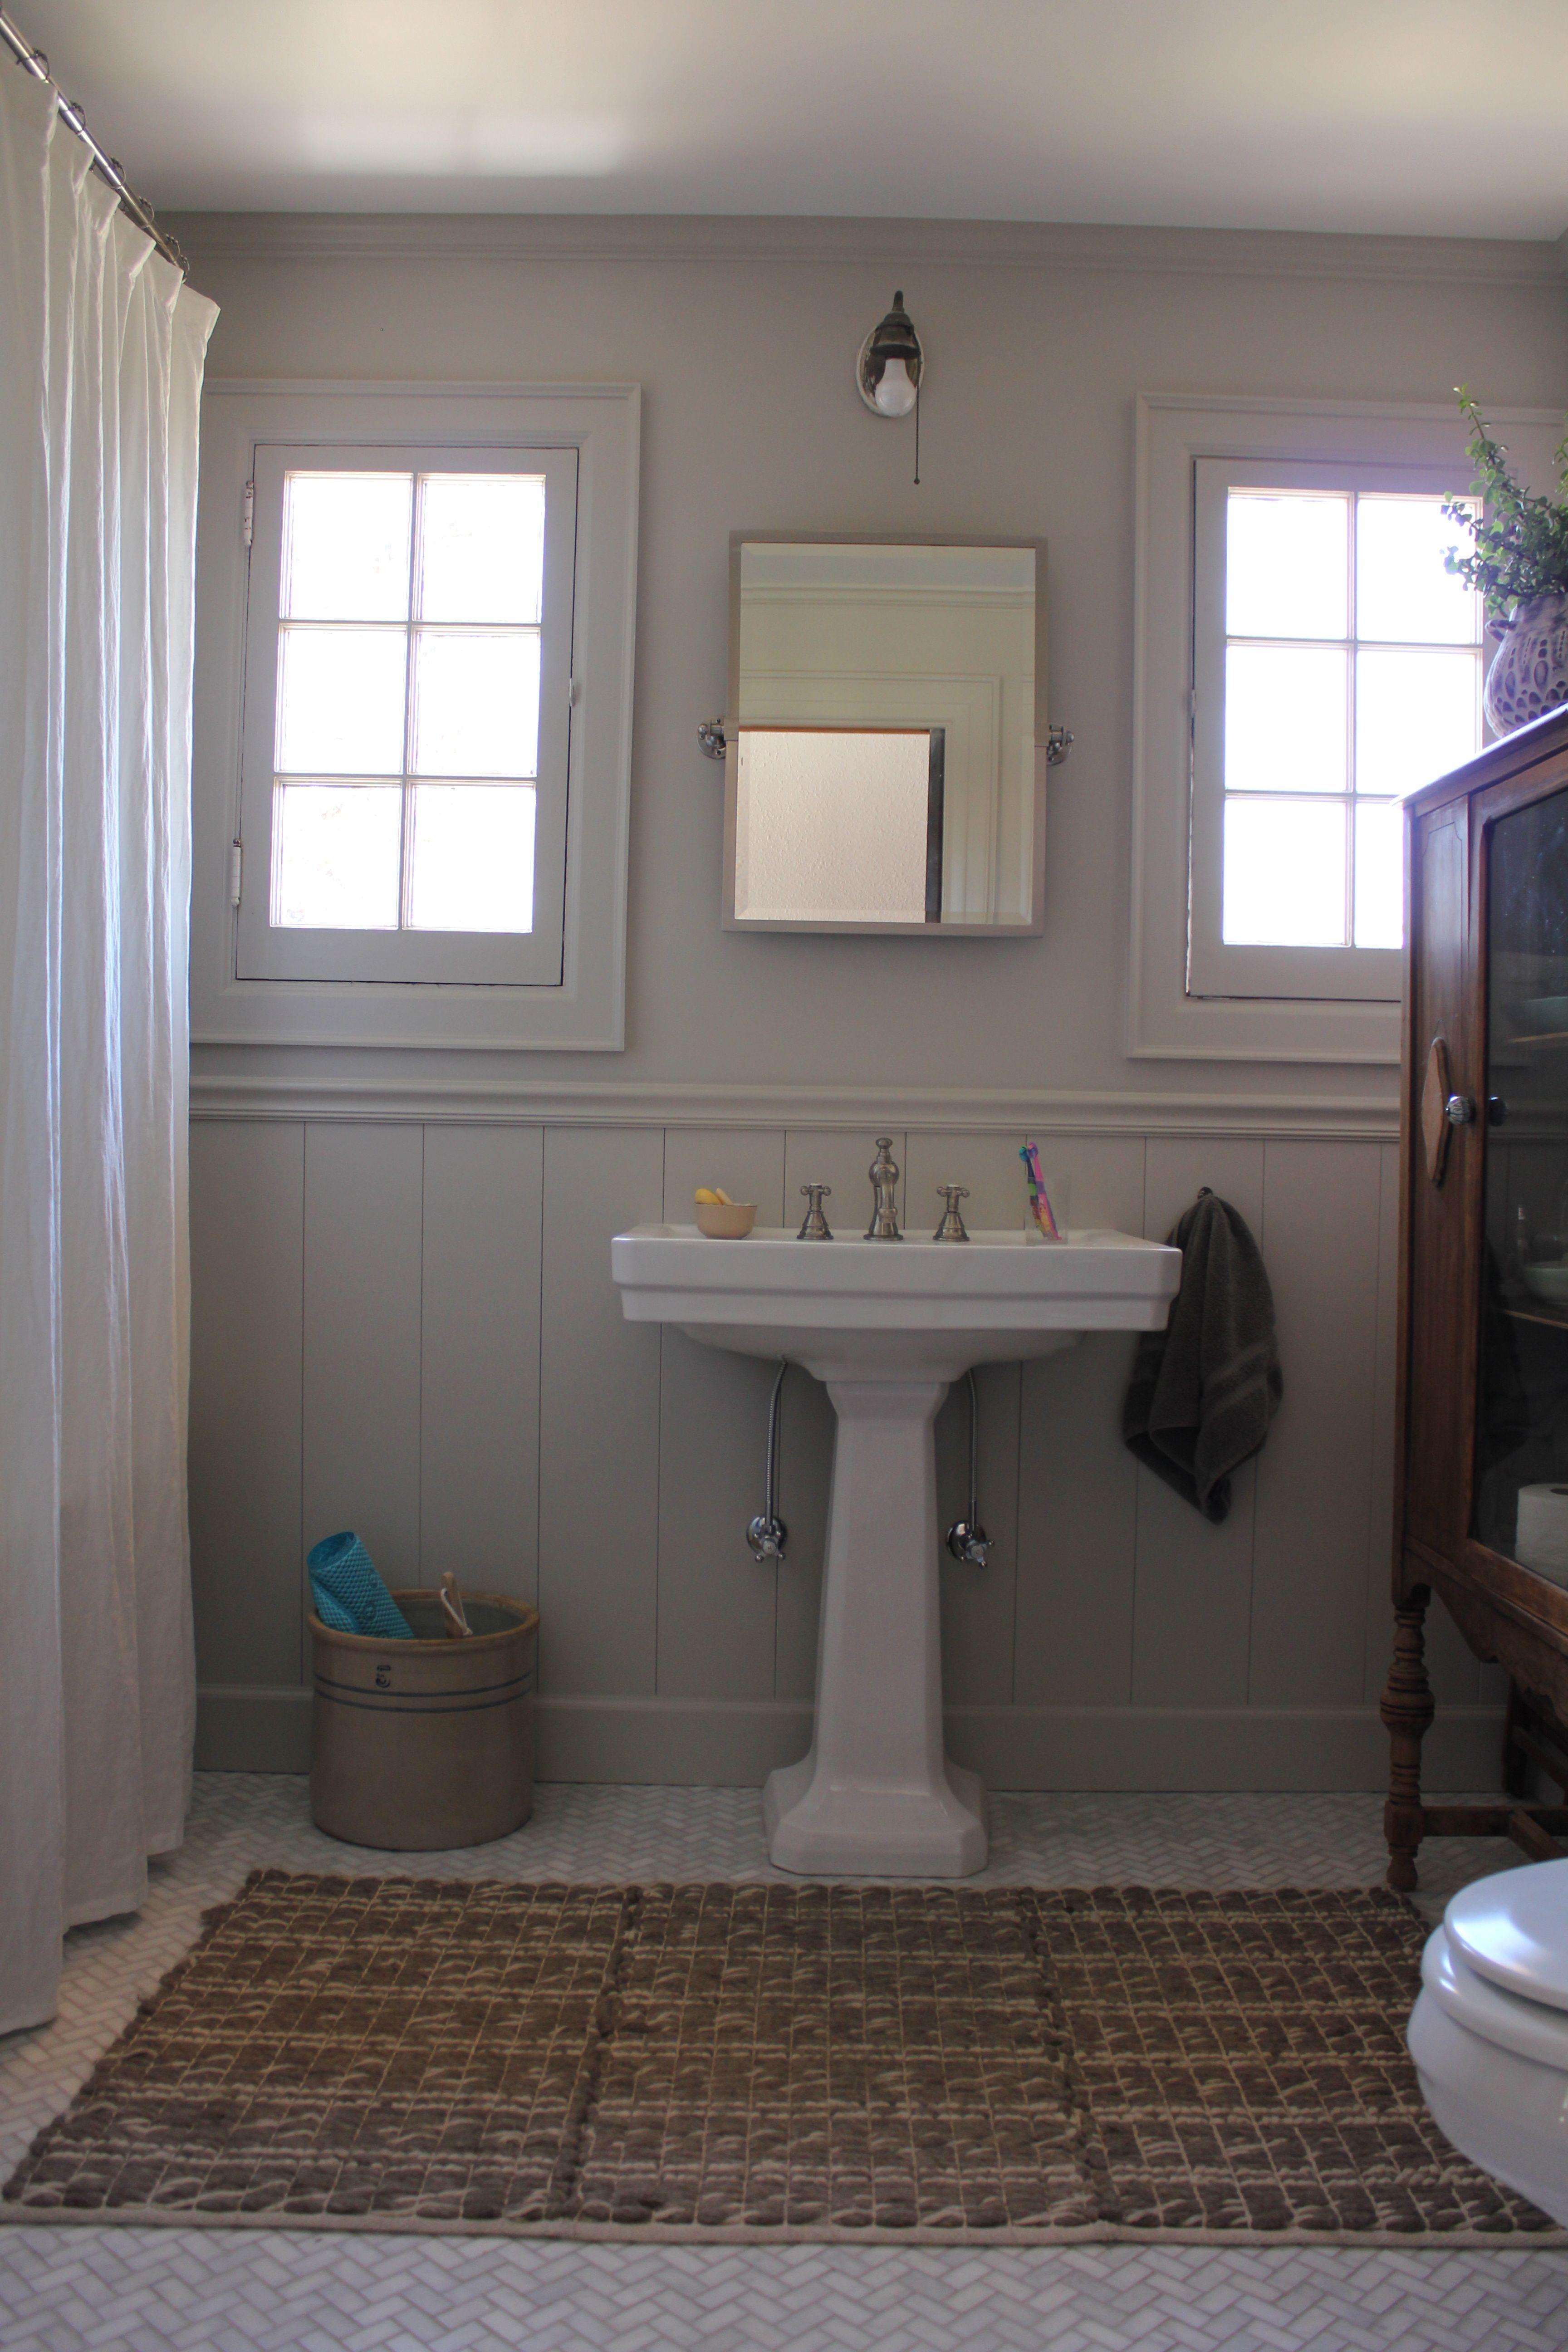 Pedestal Sink Pottery Barn Swivel Mirror Antique Cabinet